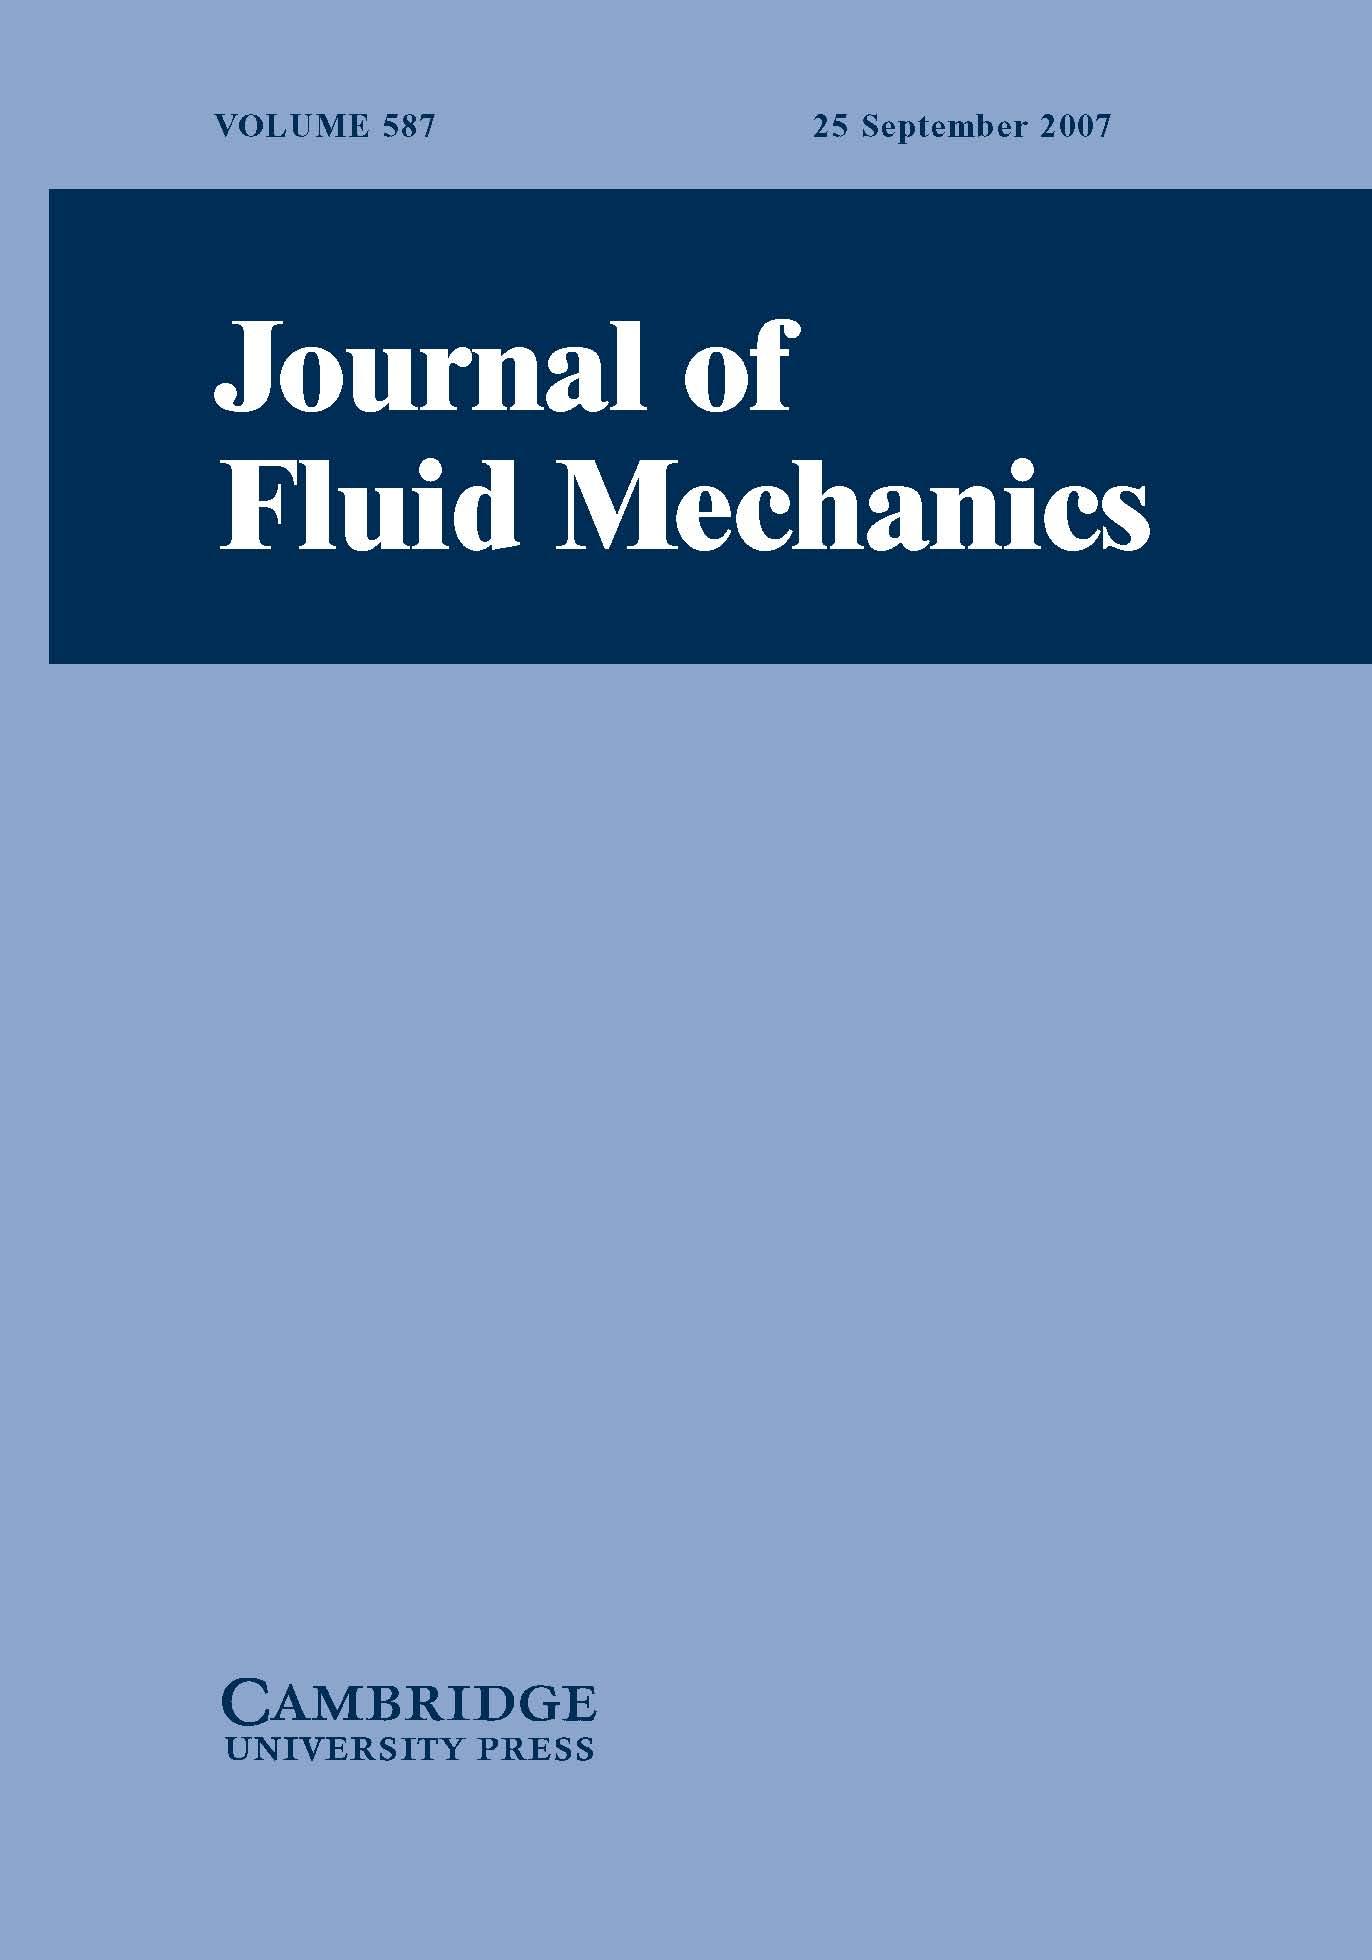 Journal of Fluid Mechanics Volume 587 - Issue  -